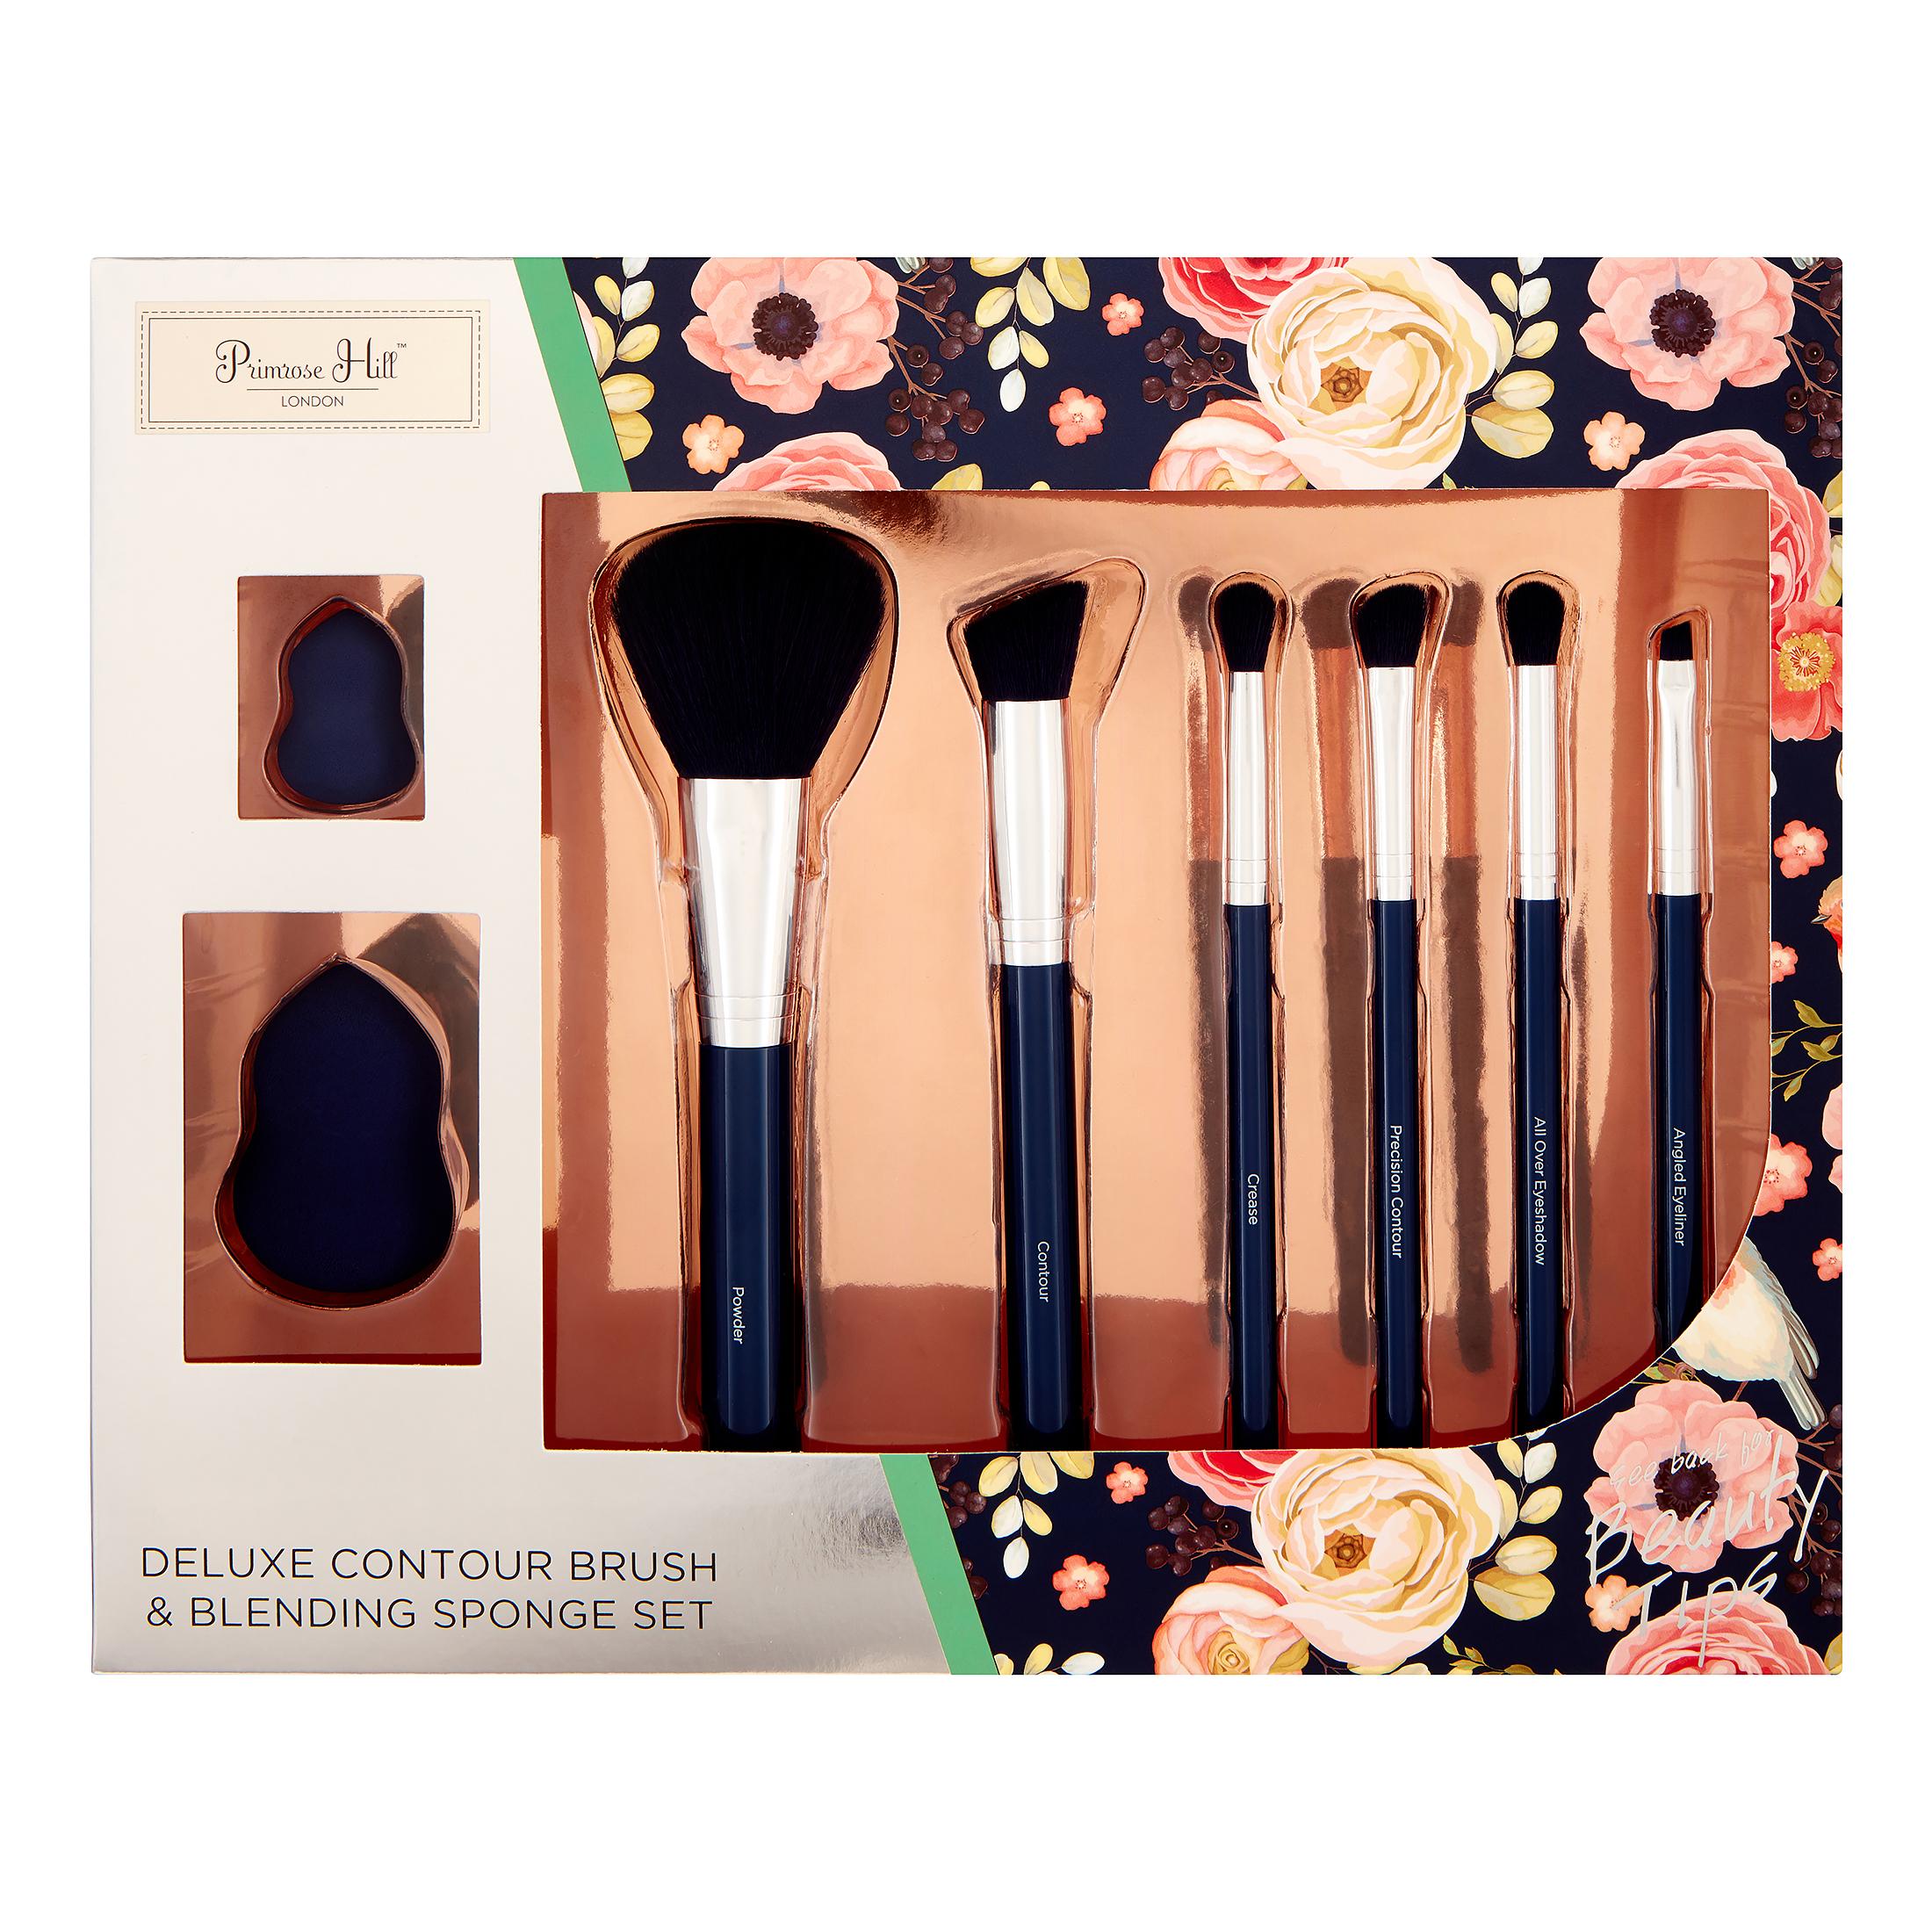 ($70 Value) Primrose Hill Cosmetic Contour Brush & Blending Sponge Set Rose Floral